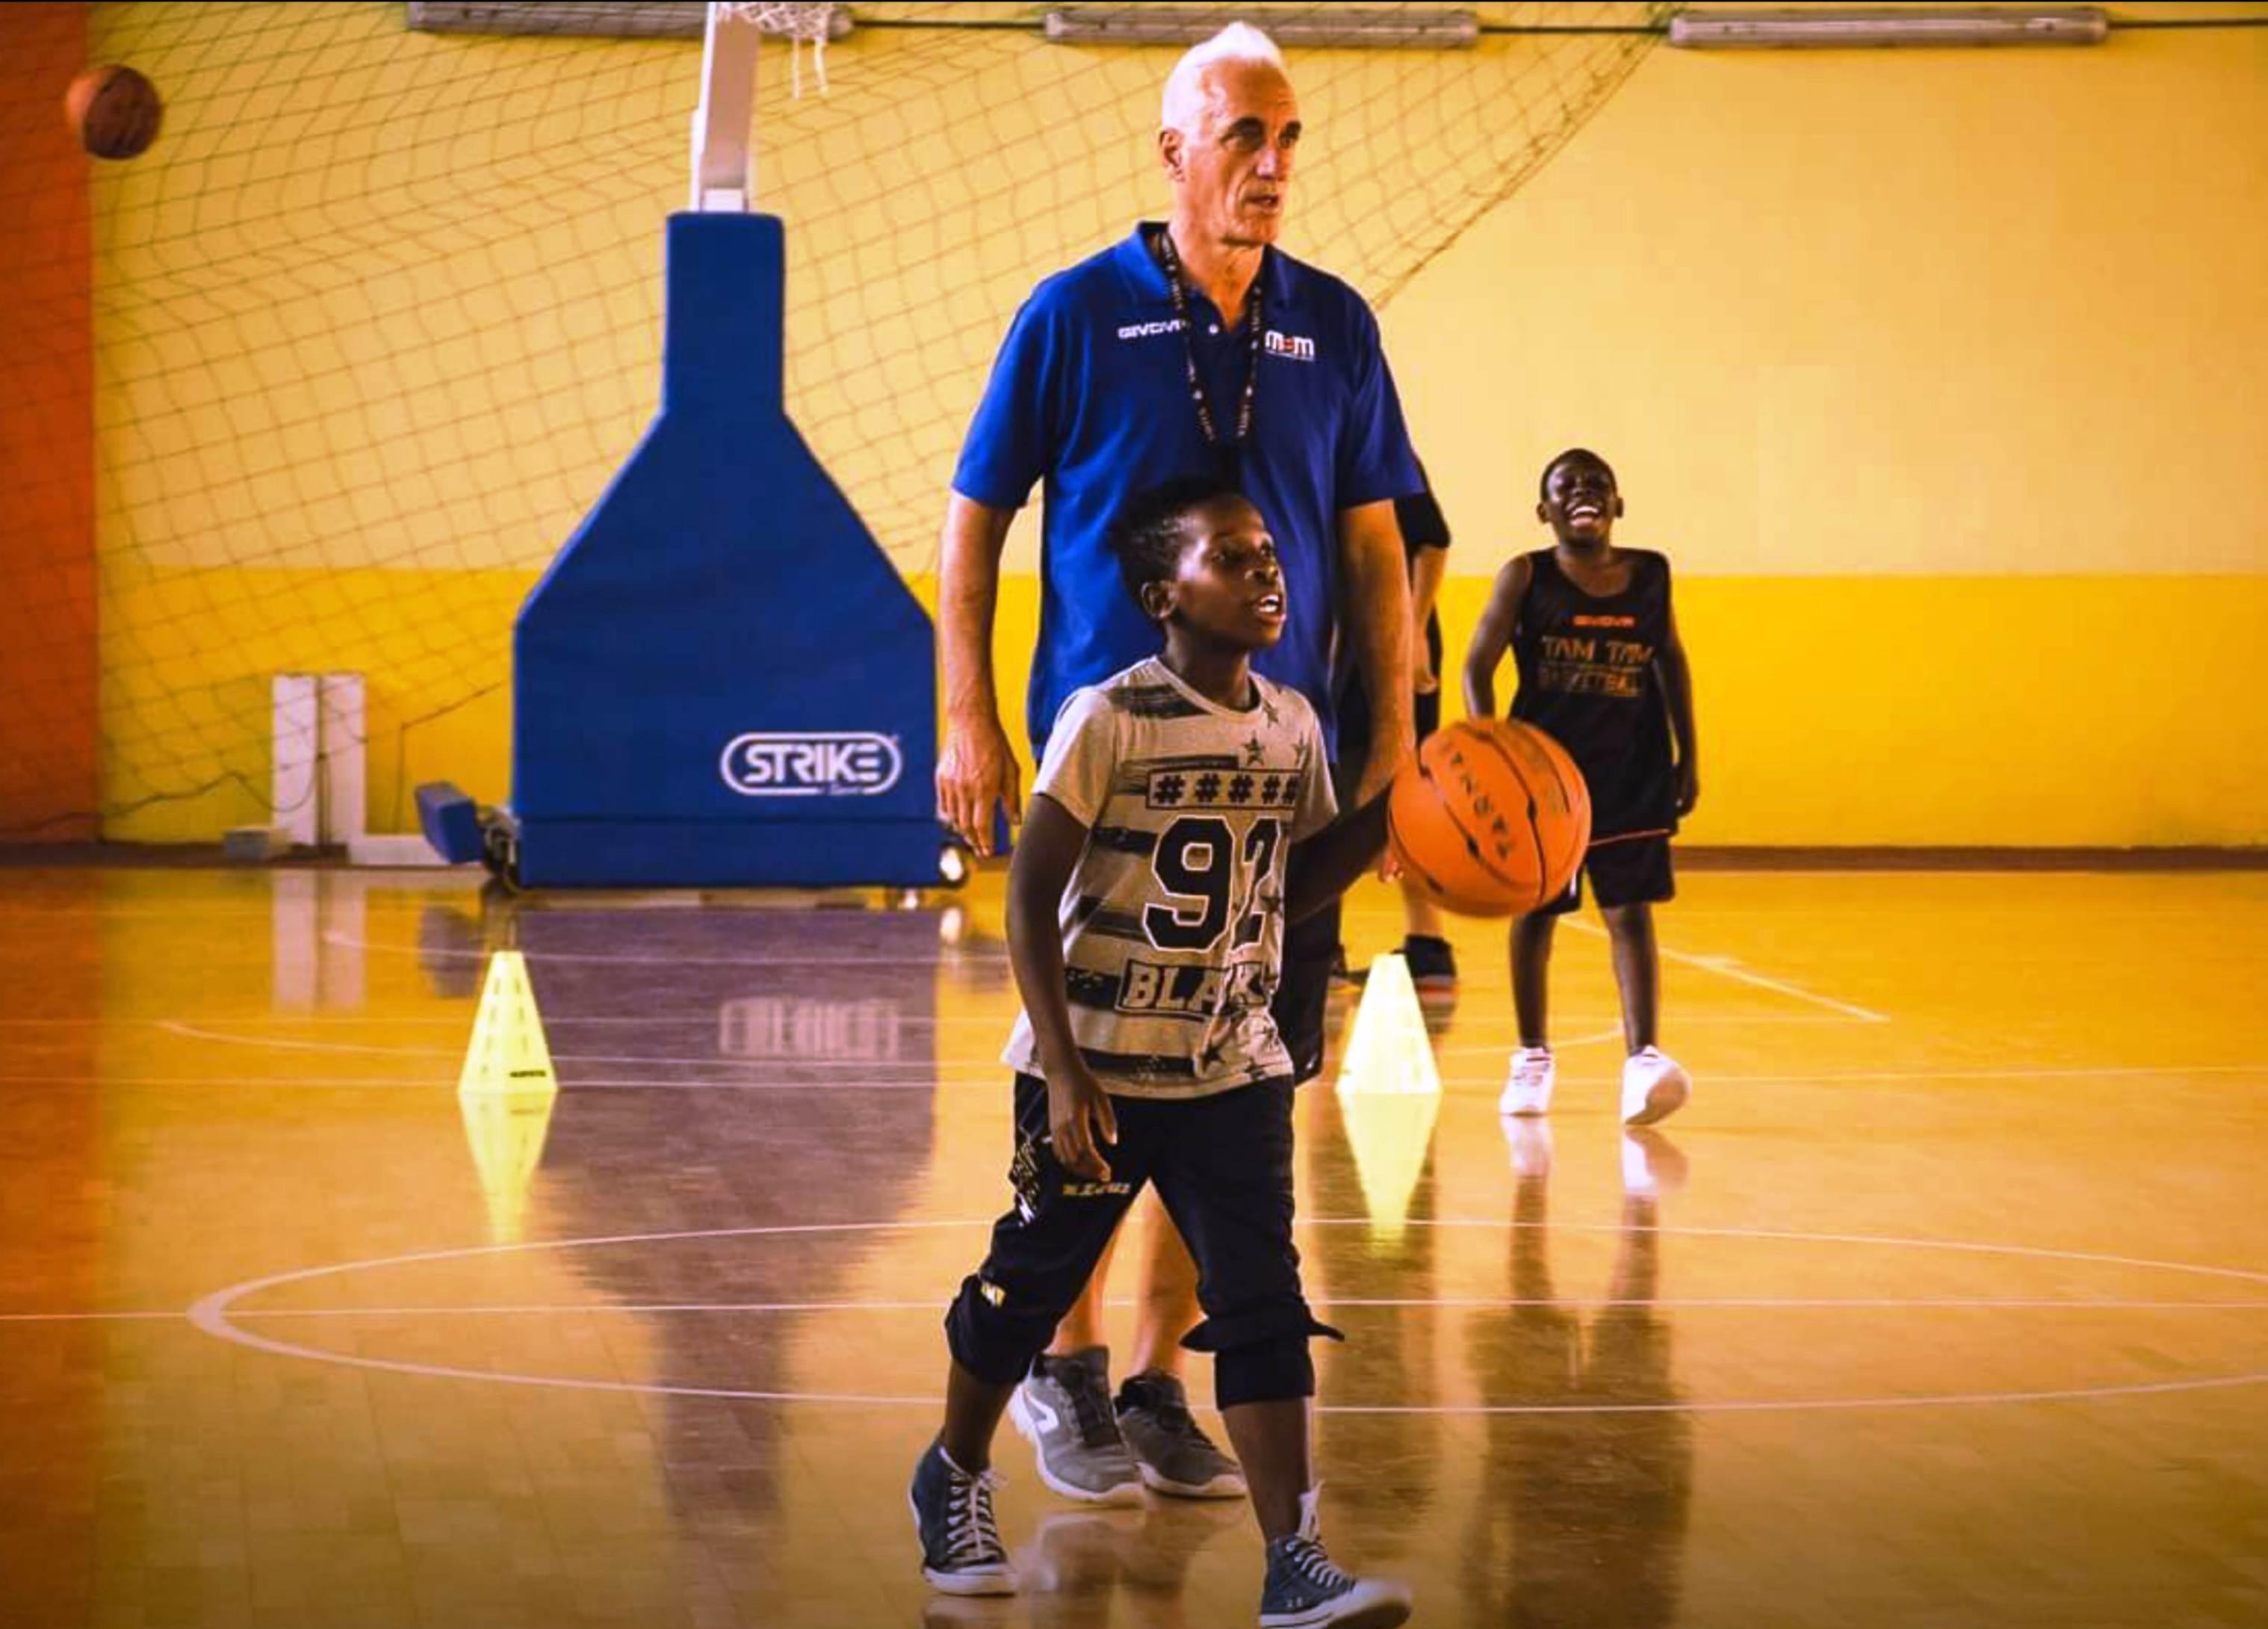 Tam Tam Basket Massimo Antonelli